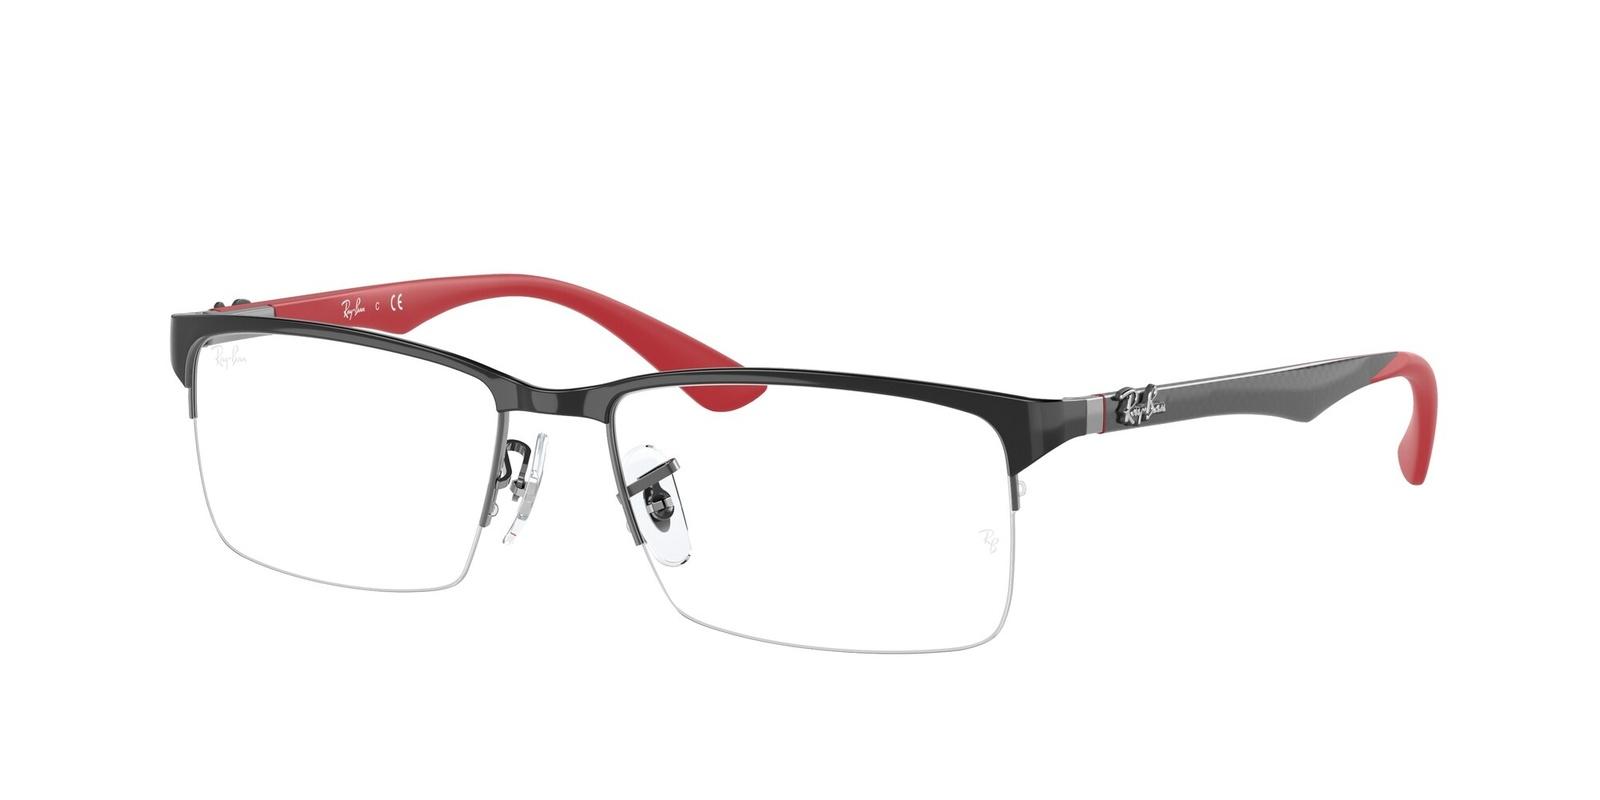 Ray Ban RX8411 Eyeglasses